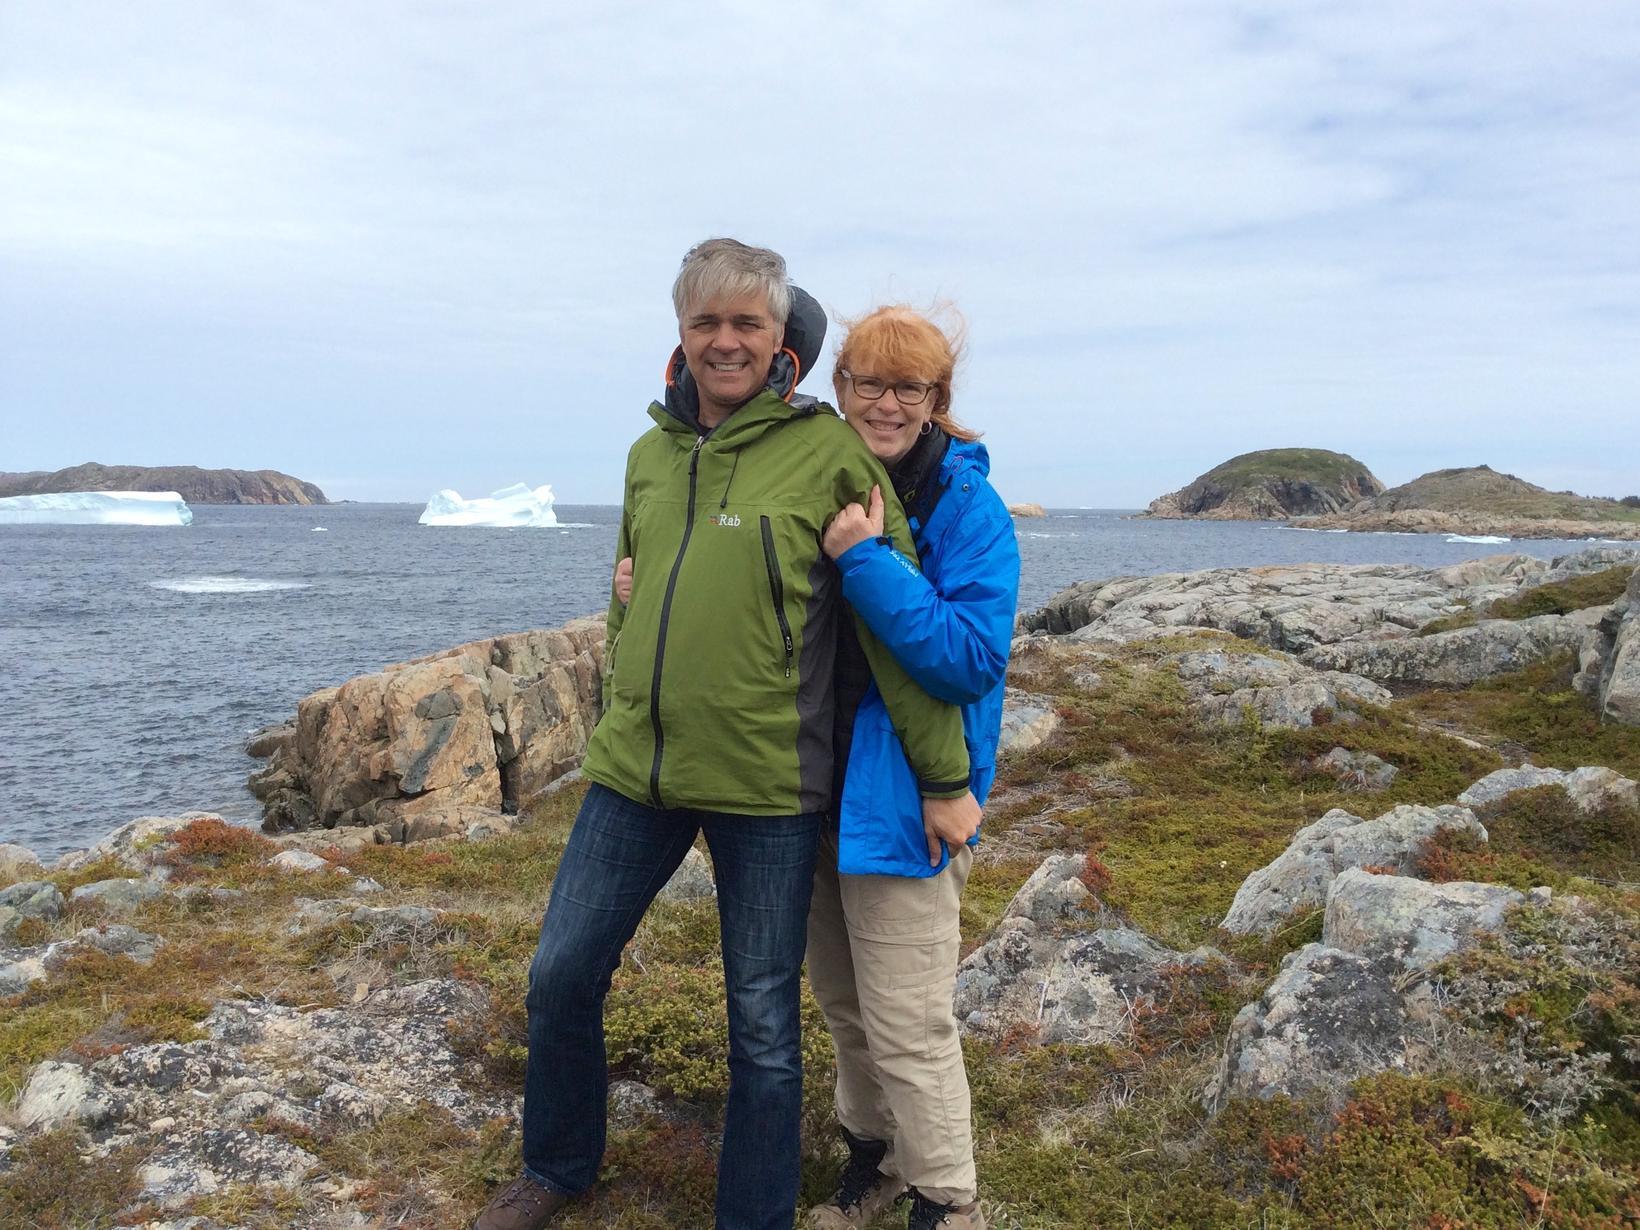 Louise & Pierre from Montréal, Quebec, Canada